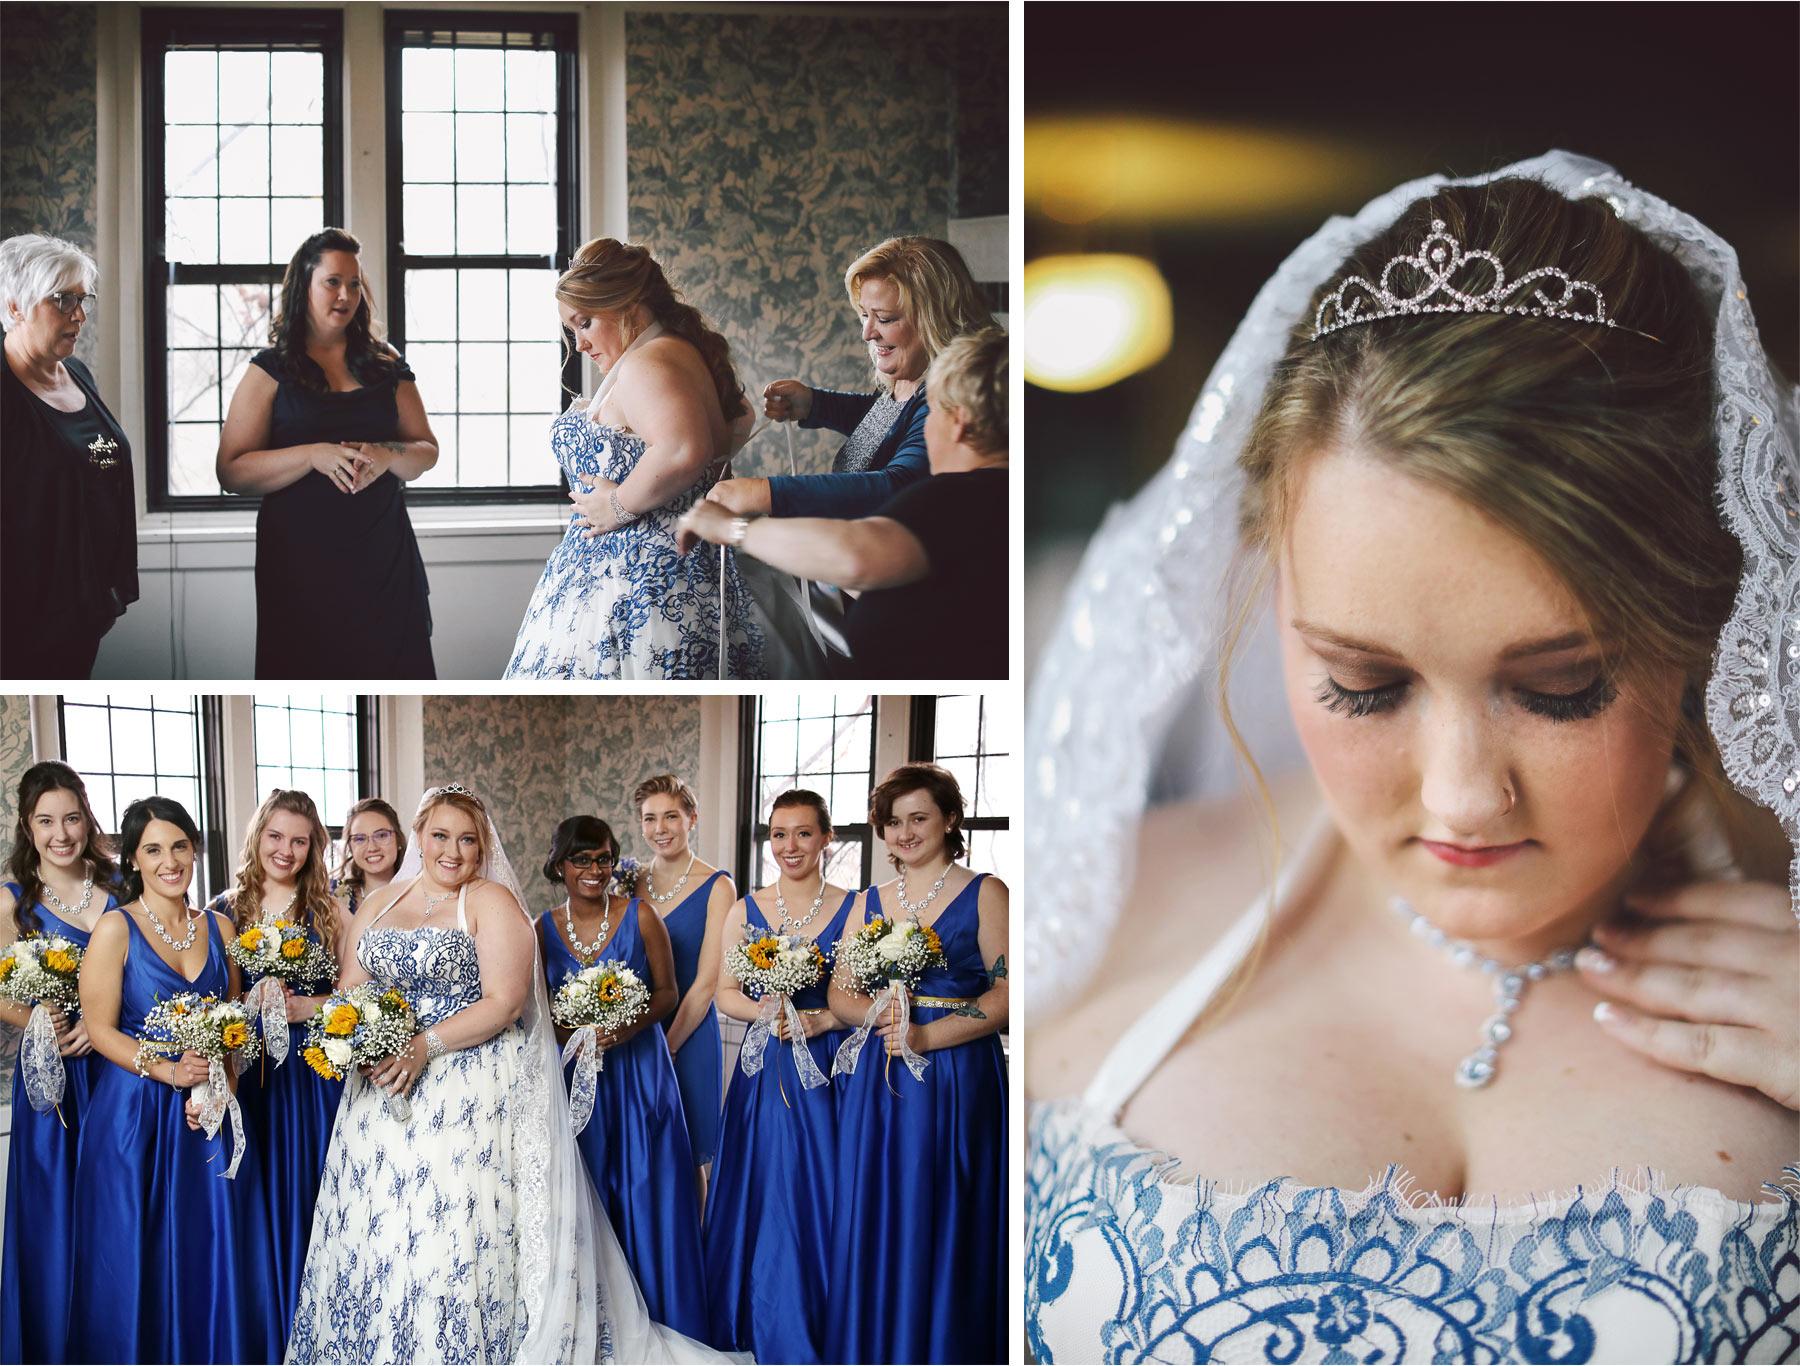 03-Saint-Paul-Minnesota-Wedding-Photography-by-Vick-Photography-The-University-Club-Bridesmaids-Getting-Ready-Mari-and-Giuseppe.jpg